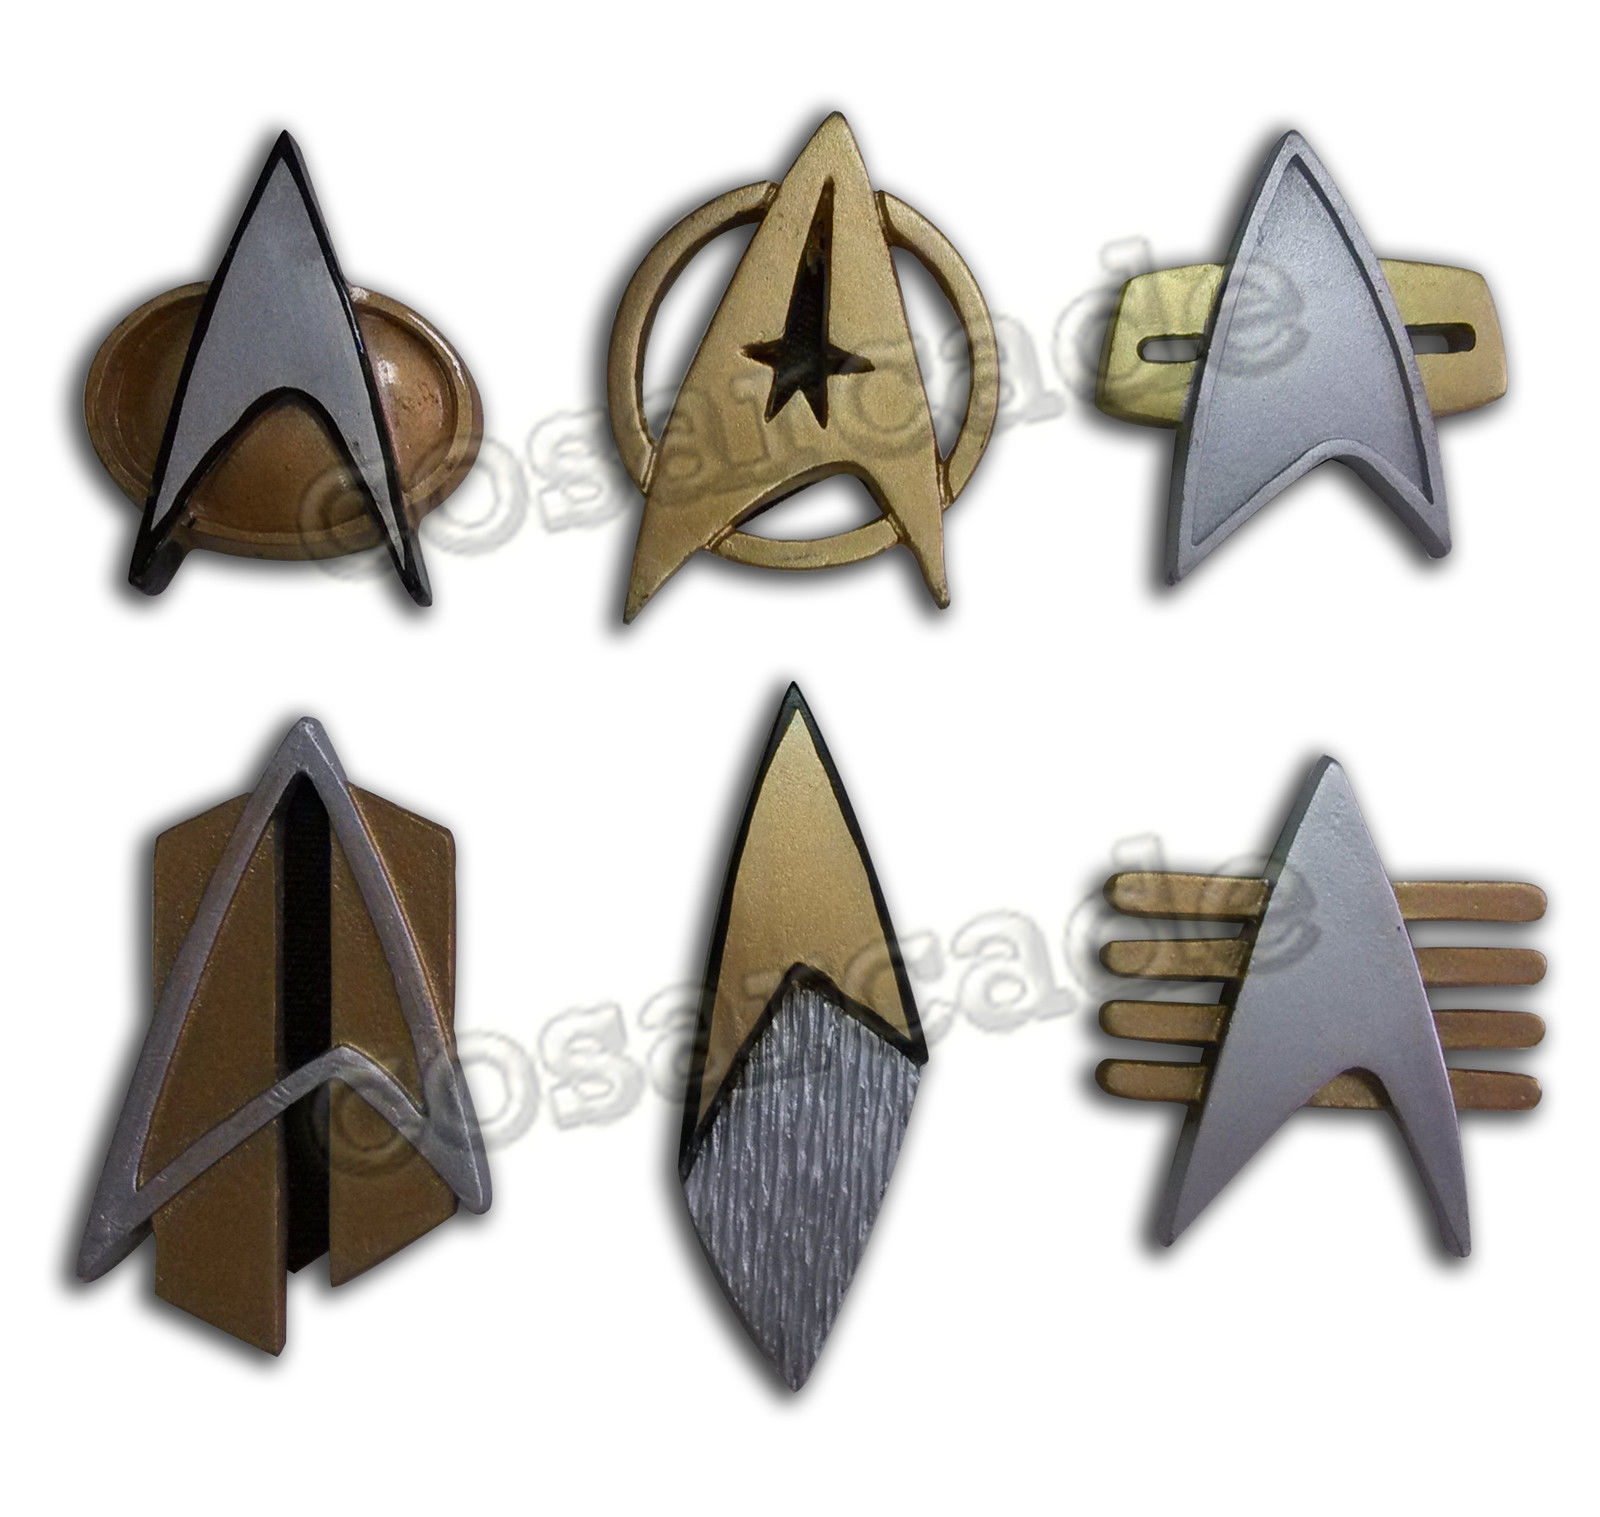 Star Cosplay Badges Trek Starfleet Captain Badge Combadge Rank Pip Pin Insignia Brooch Halloween Carnival Prop